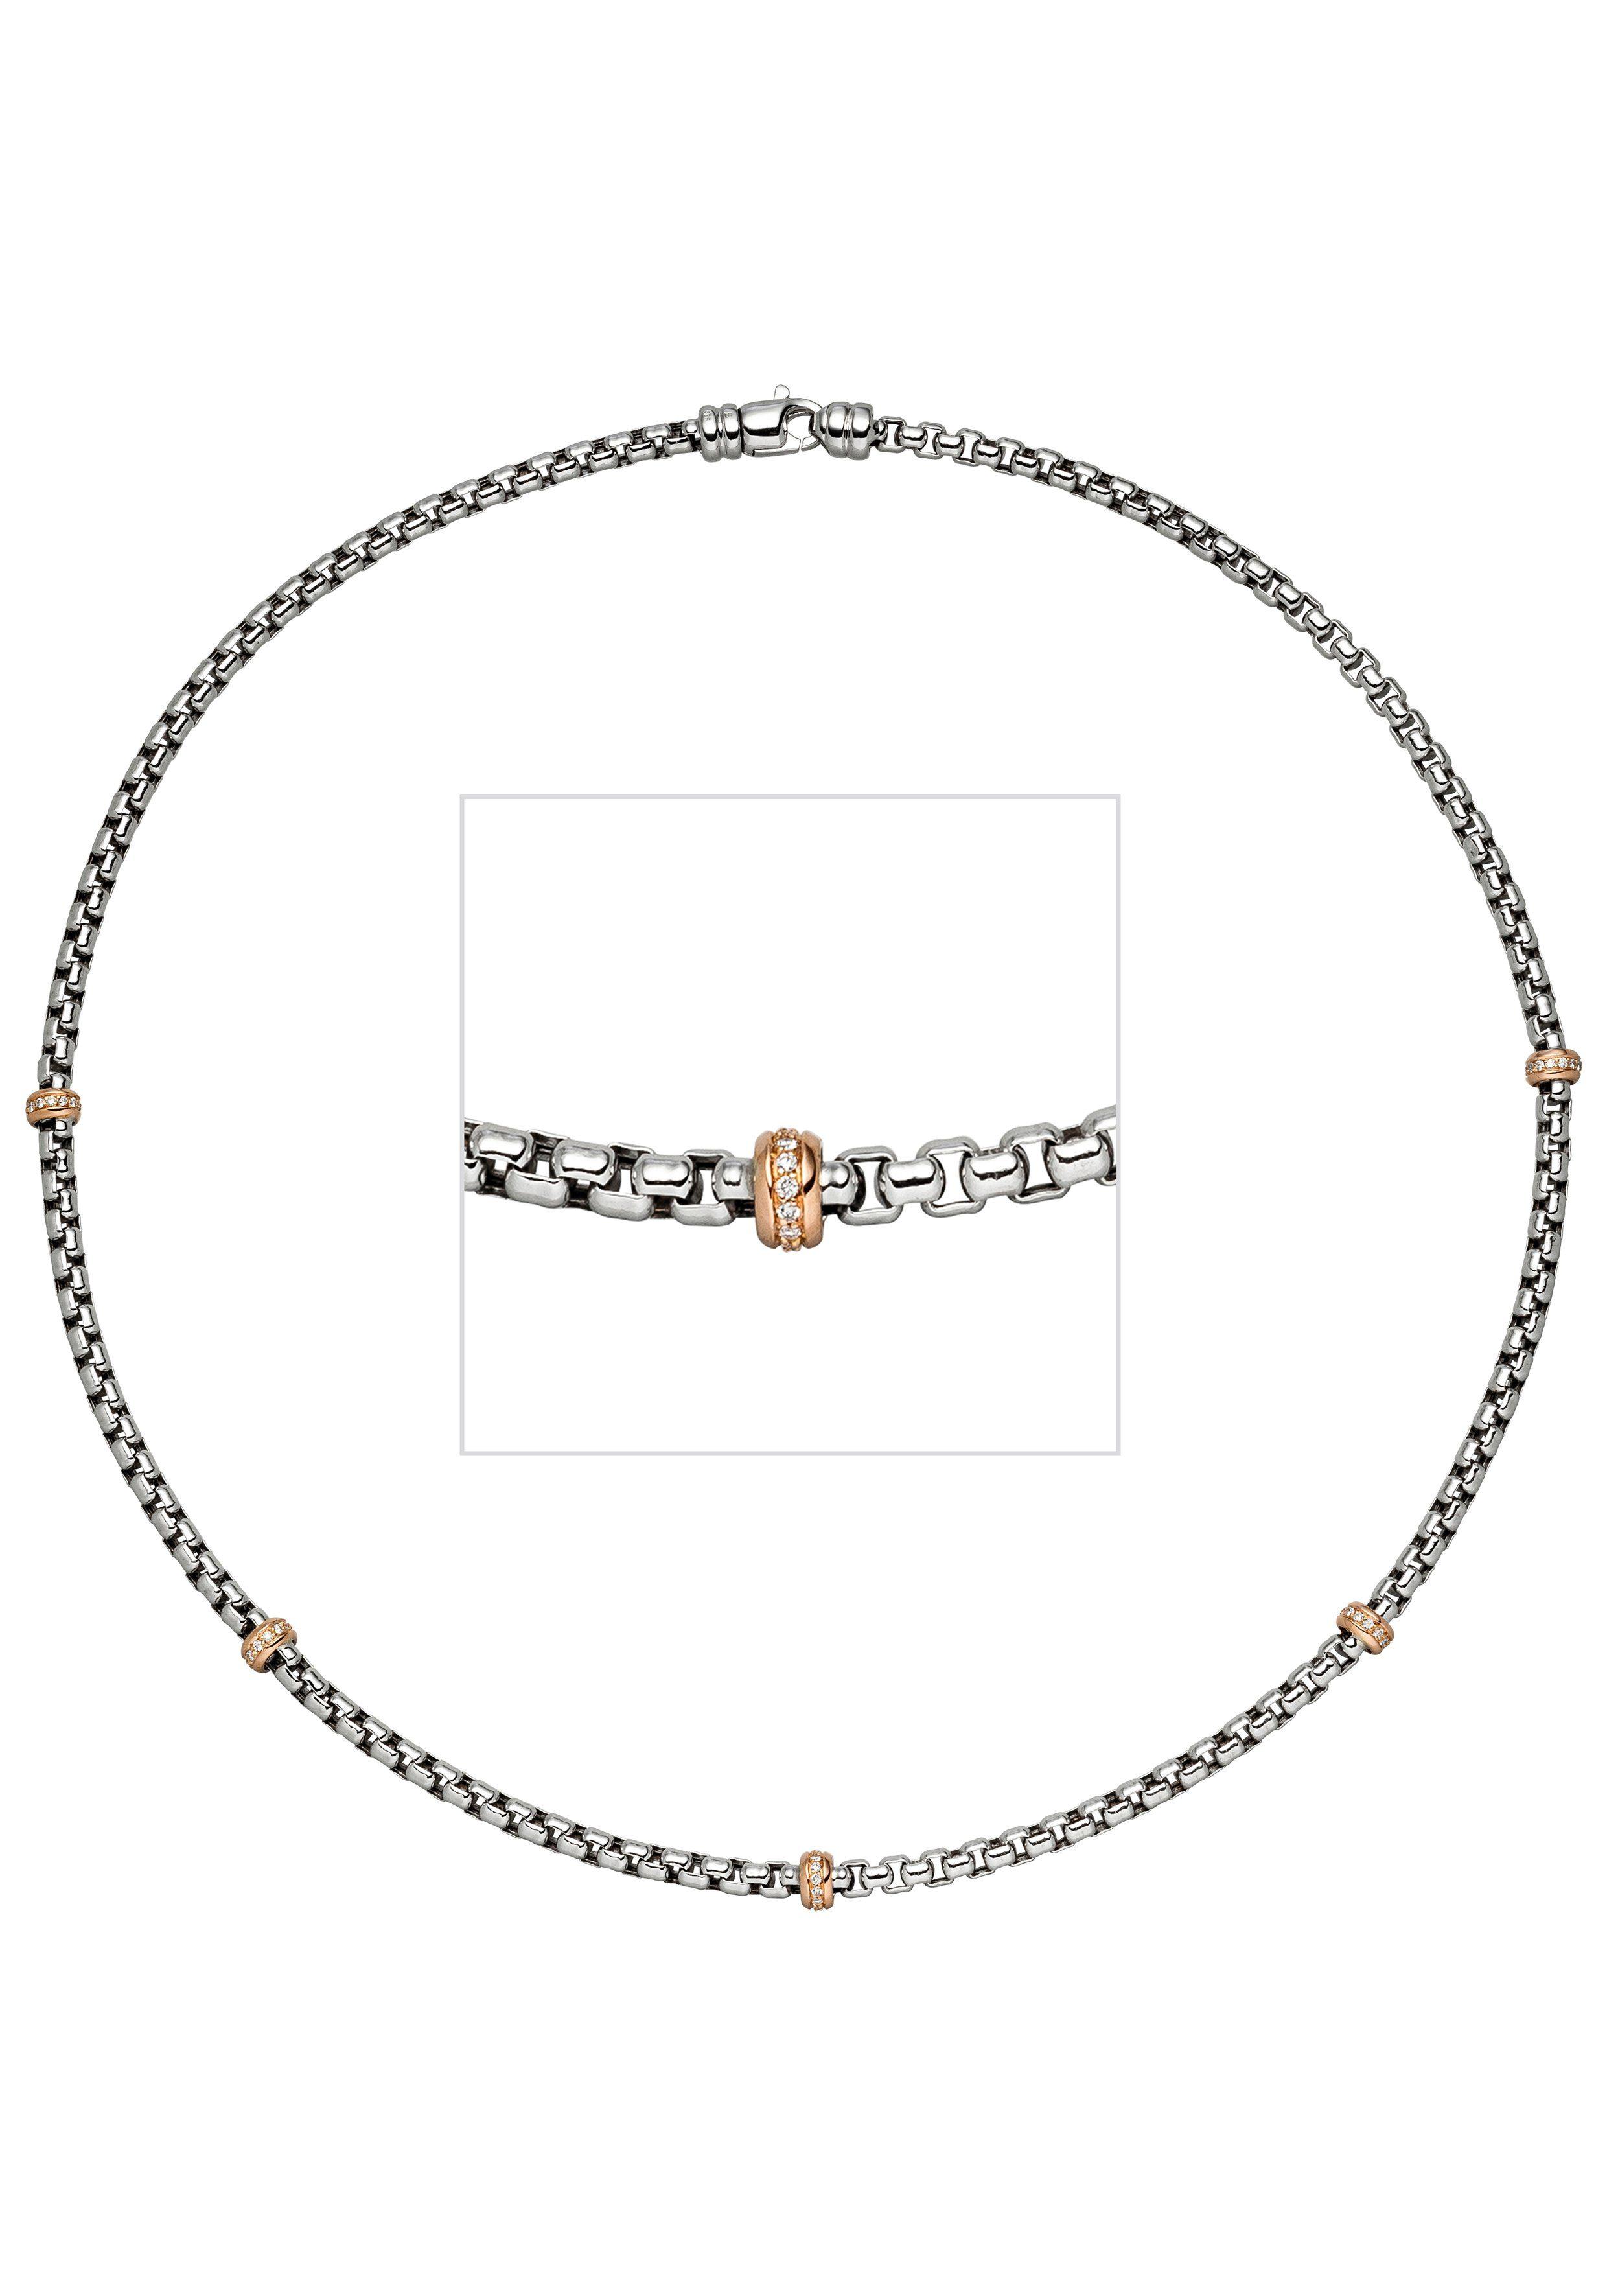 JOBO Collier 585 Gold bicolor mit 65 Diamanten 45 cm